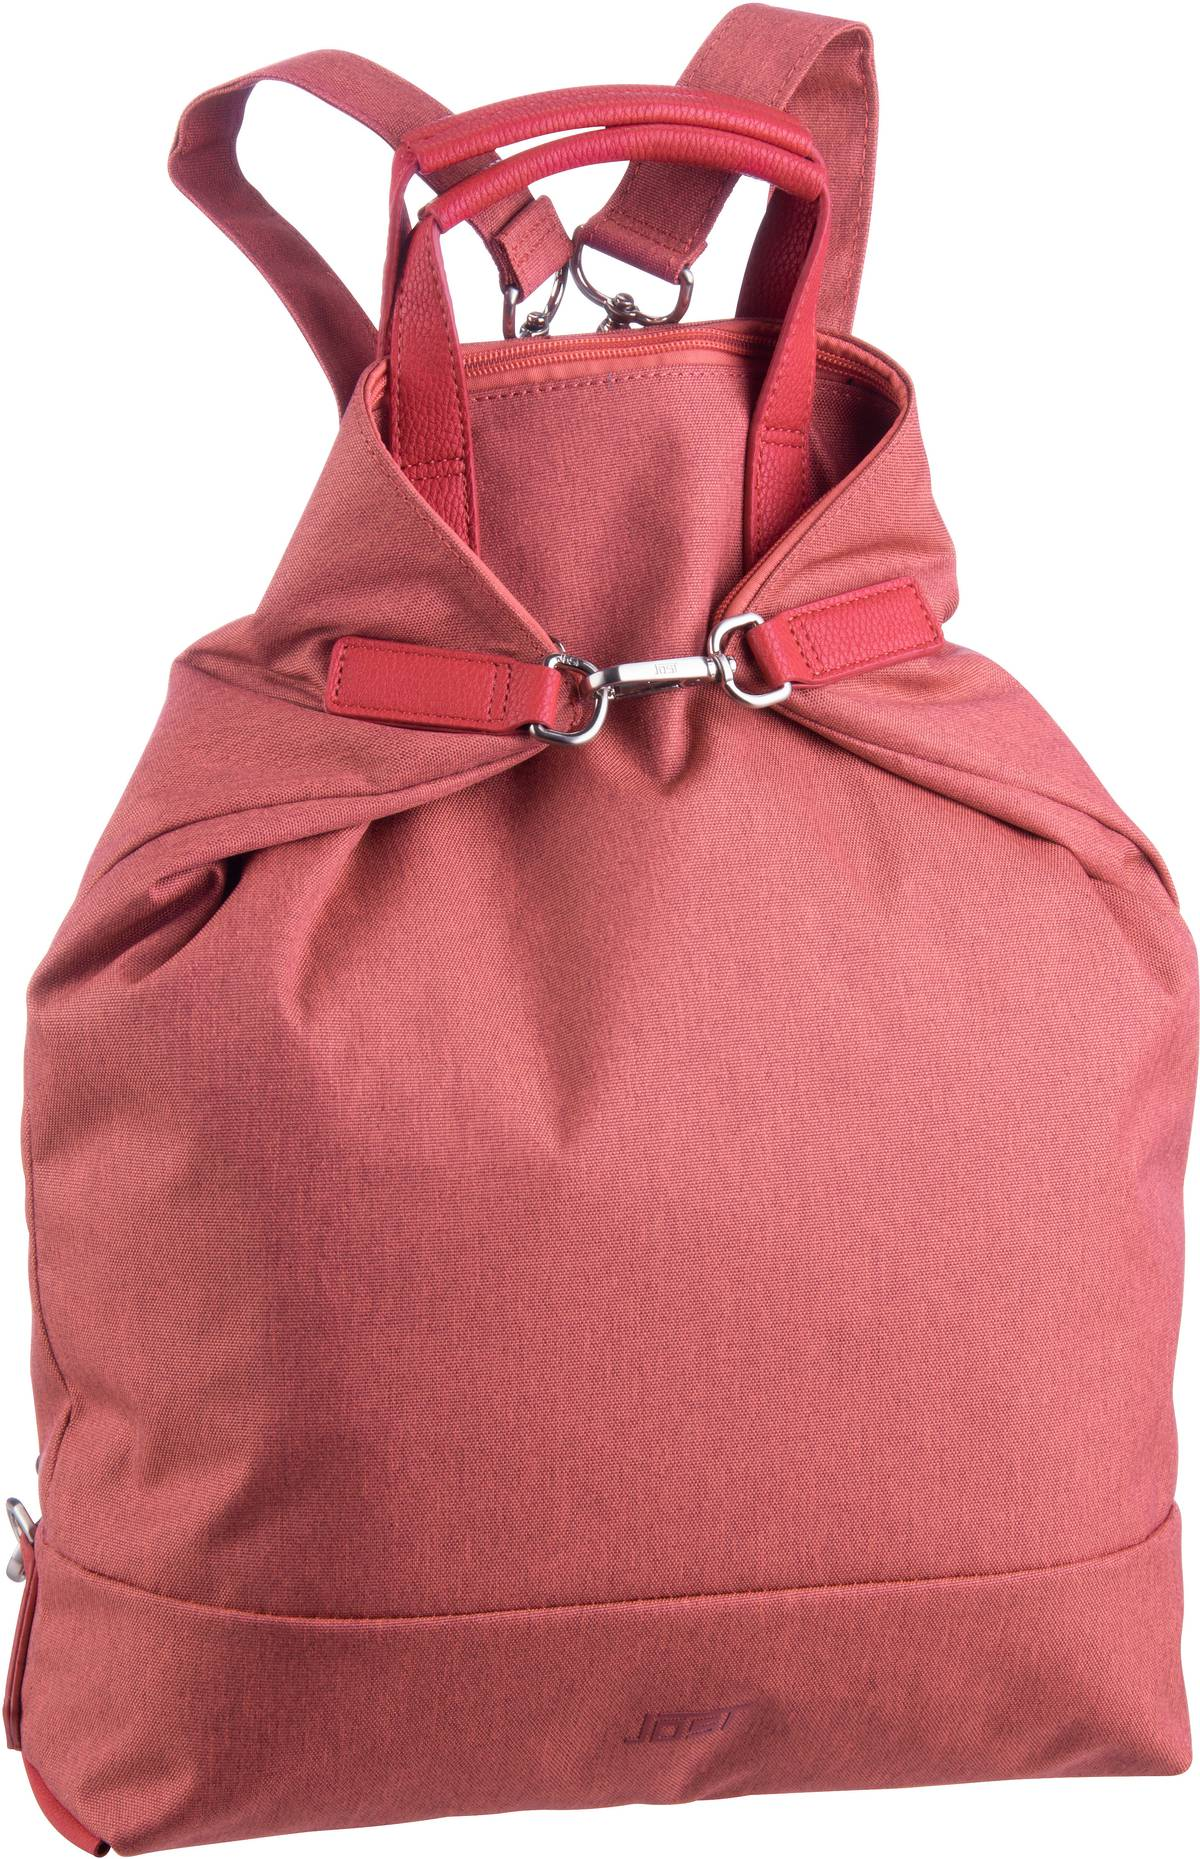 Jost Rucksack / Daypack 1105 X-Change Bag M k